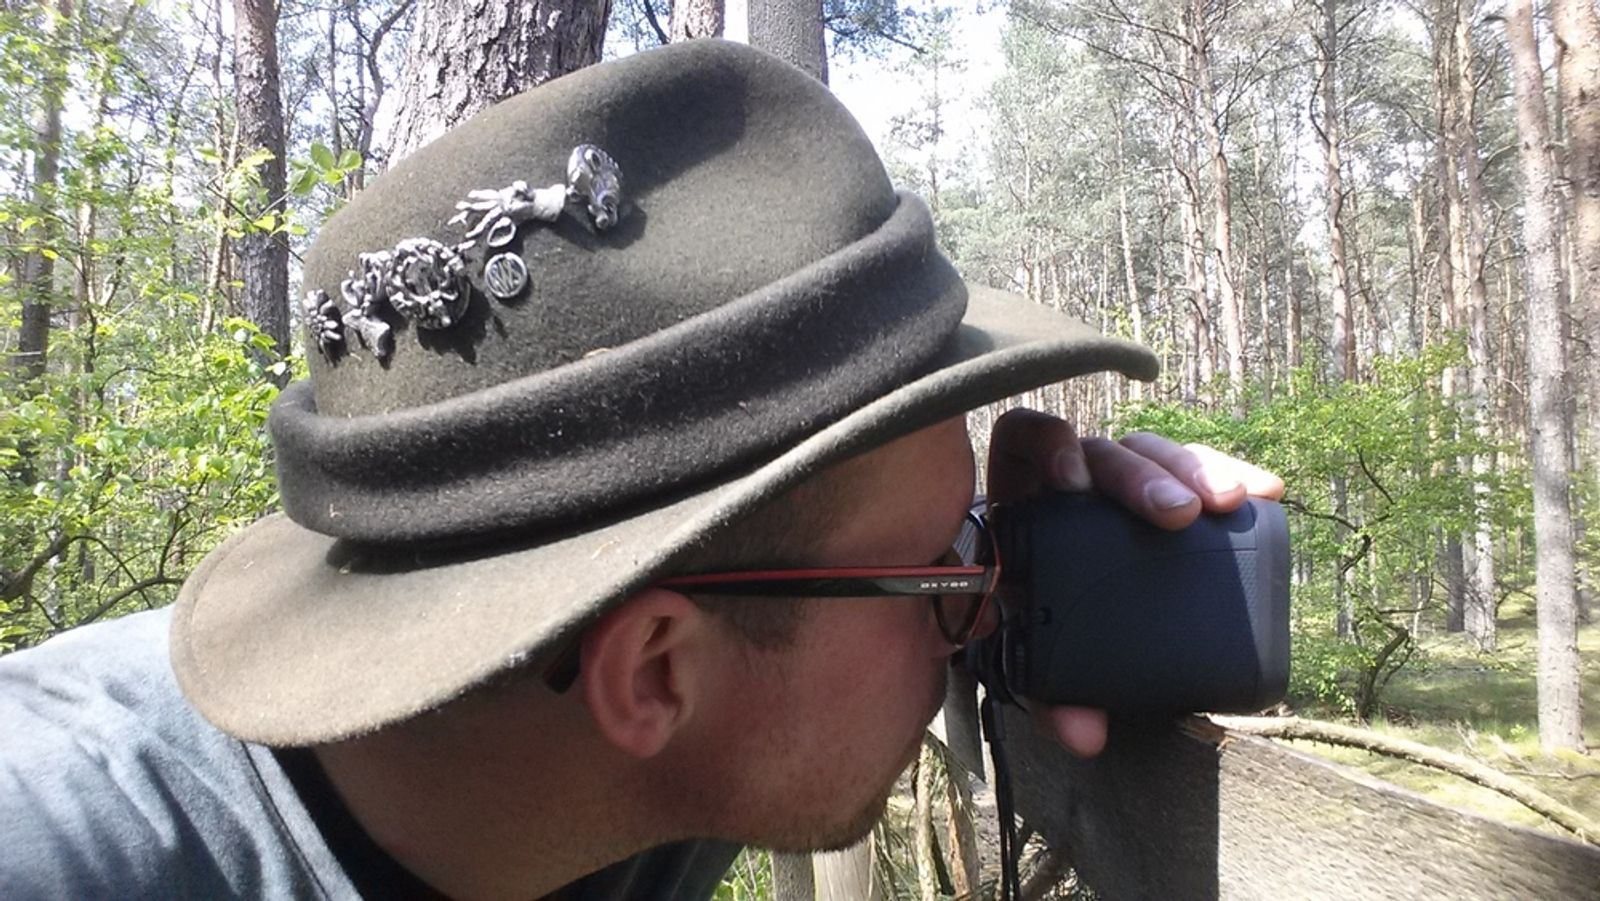 Nikon Entfernungsmesser Aculon Al11 : Laser entfernungsmesser aculon al11